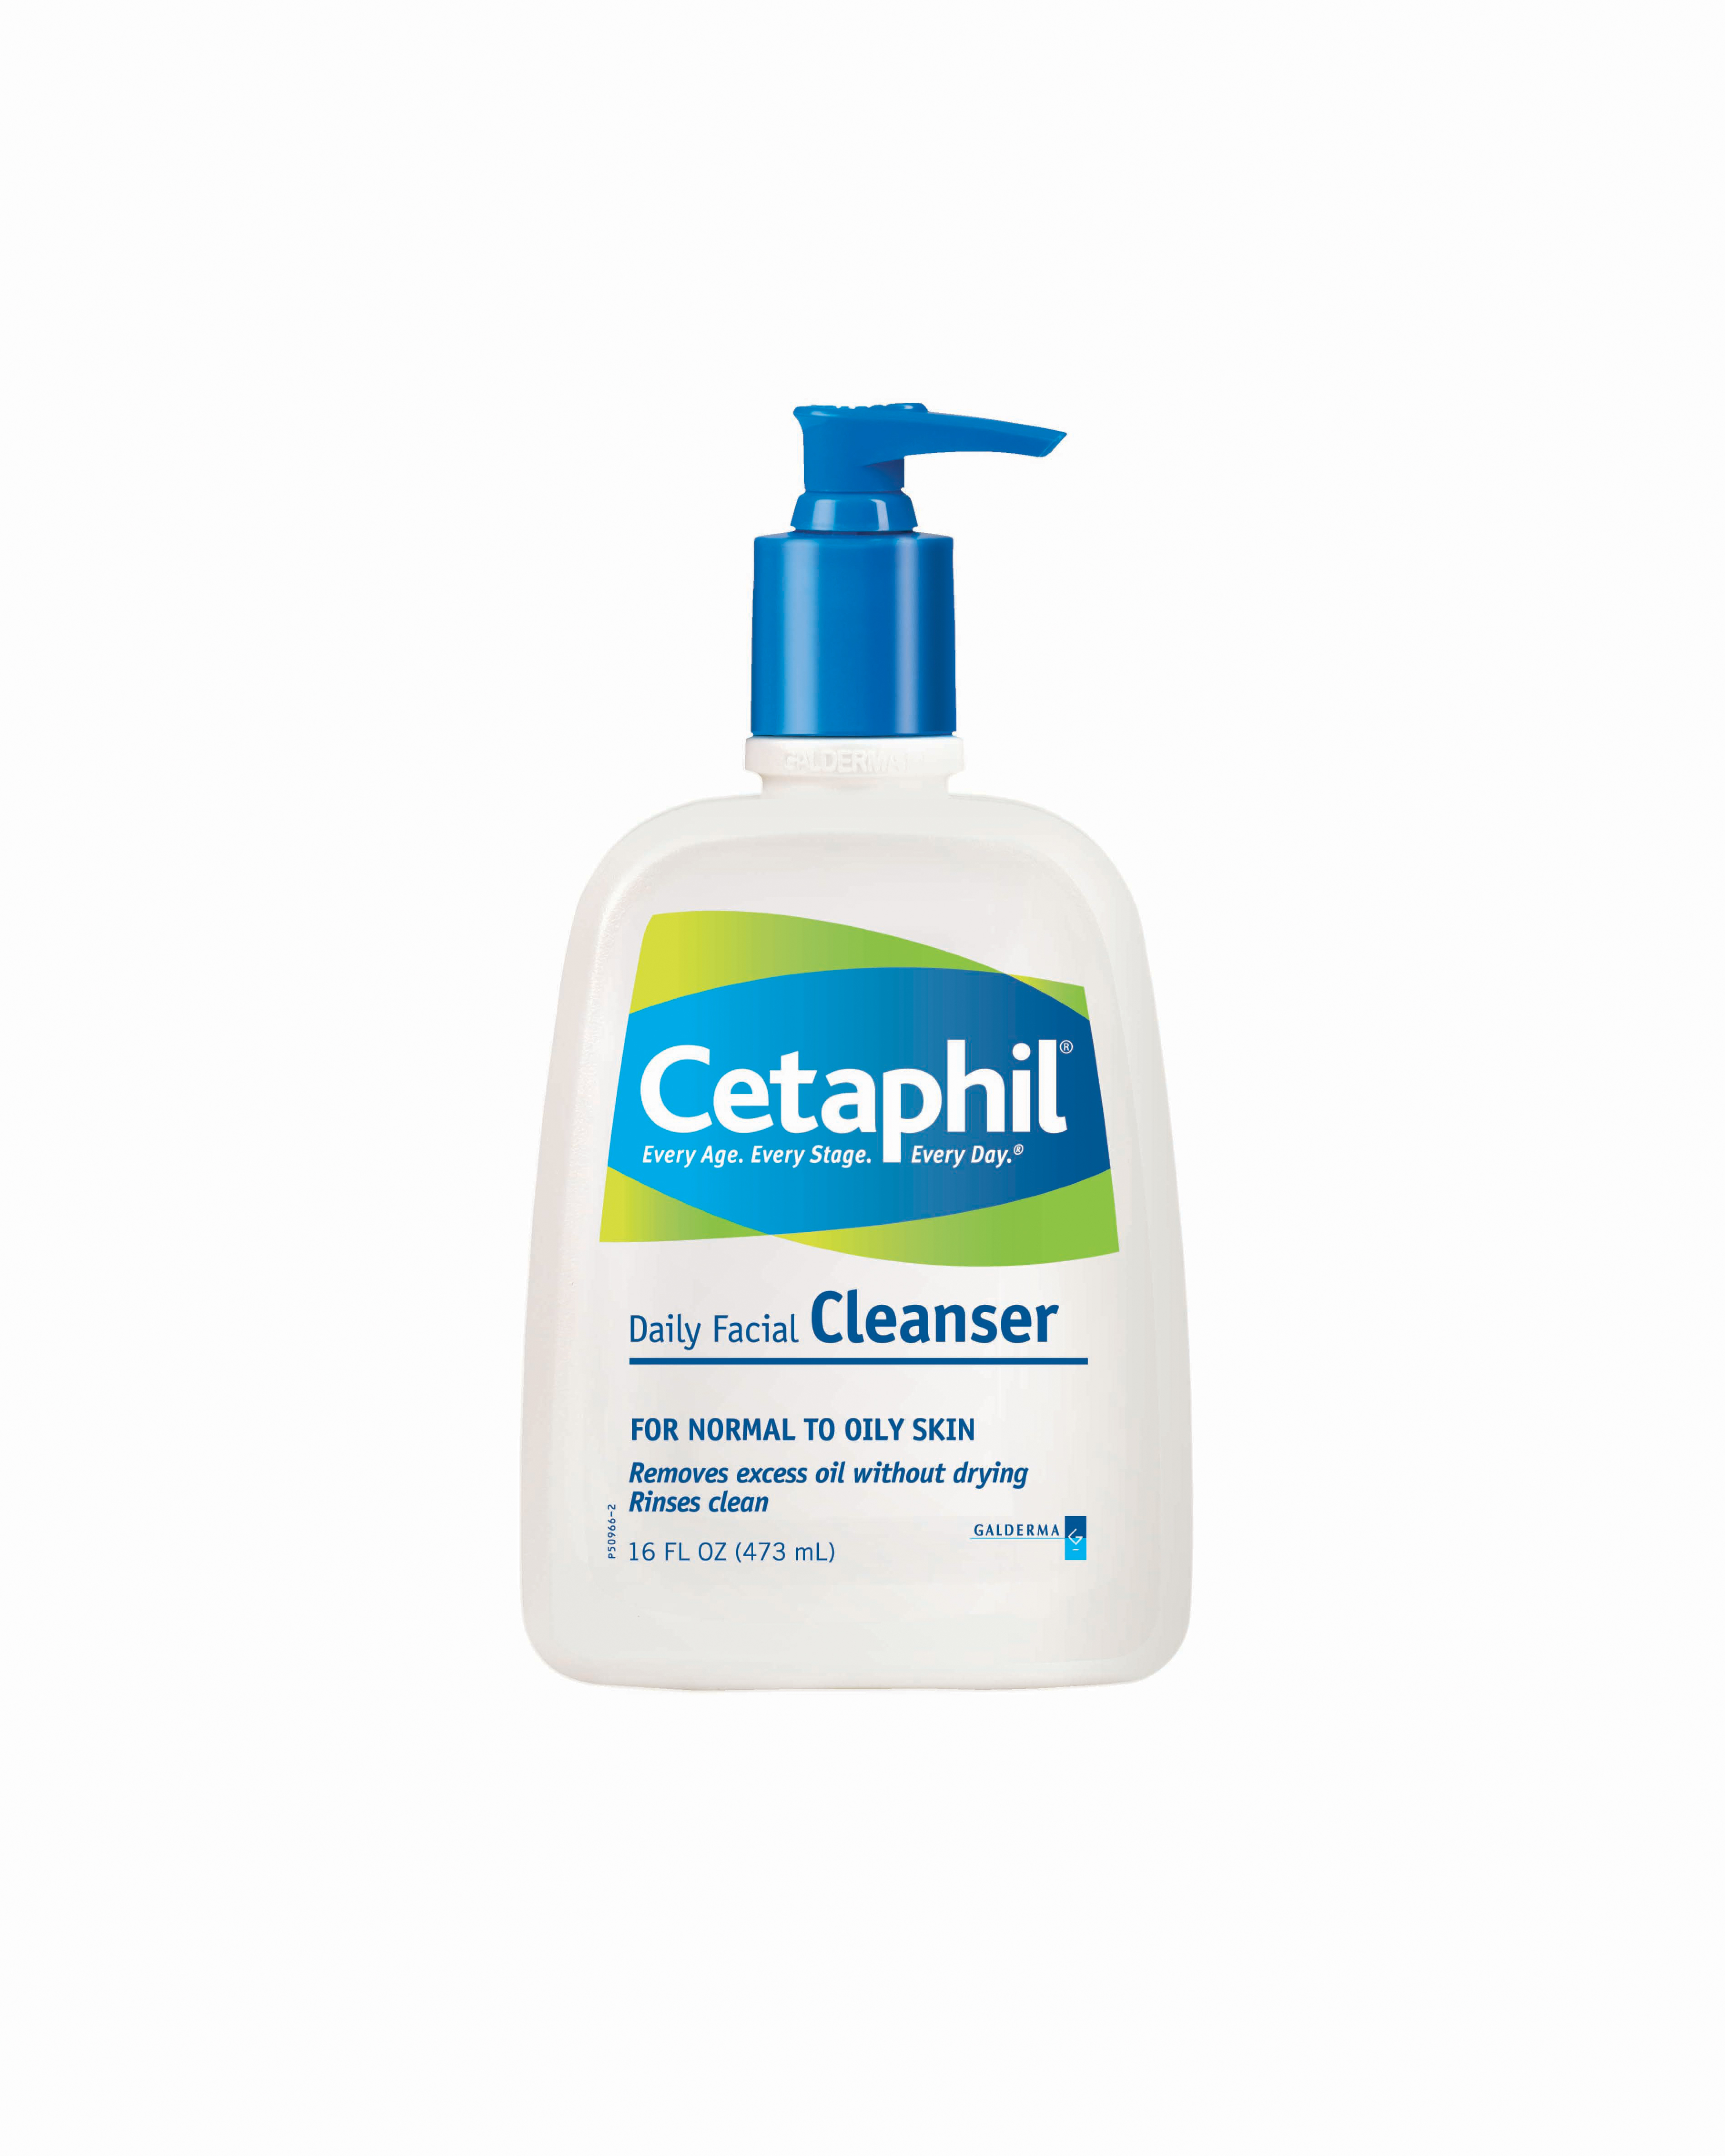 cetaphil-daily-facial-cleanser-0314.jpg